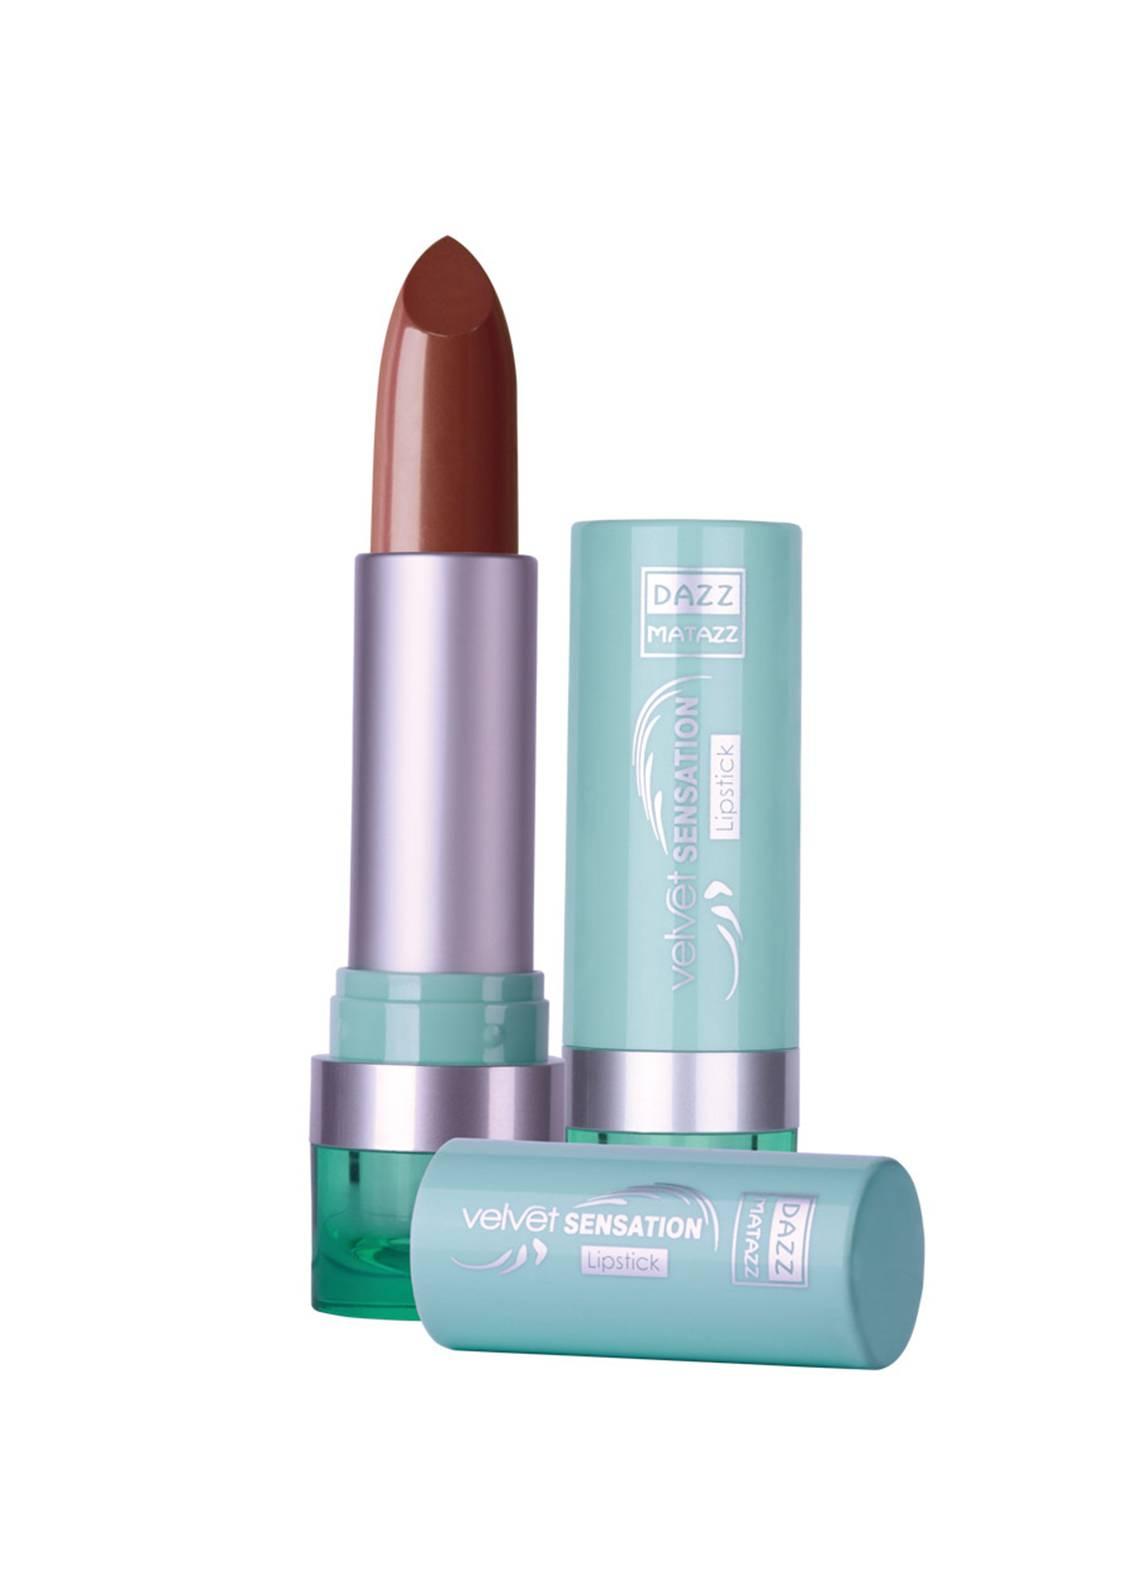 Dazz Matazz Velvet Sensation Lipstick-18 CHOCOLATE FUDGE